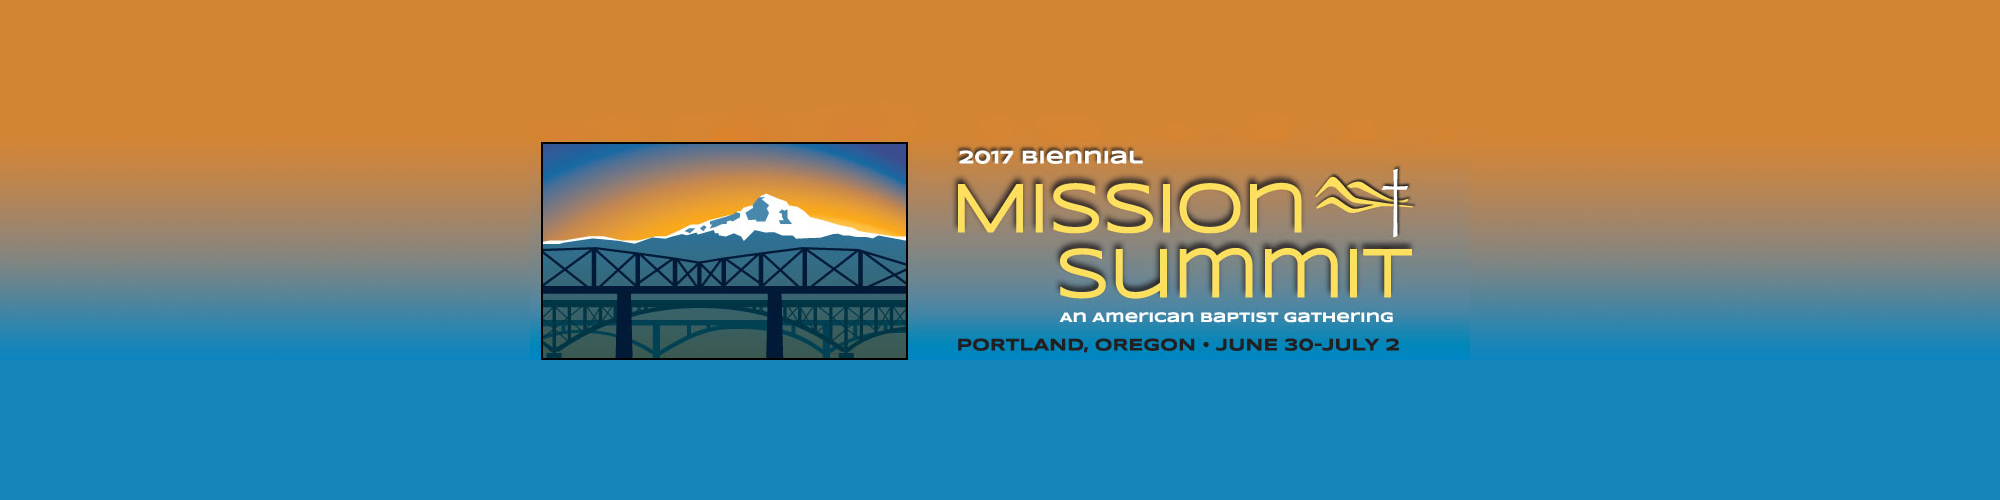 2017 Biennial Mission Summit Church Sponsorship